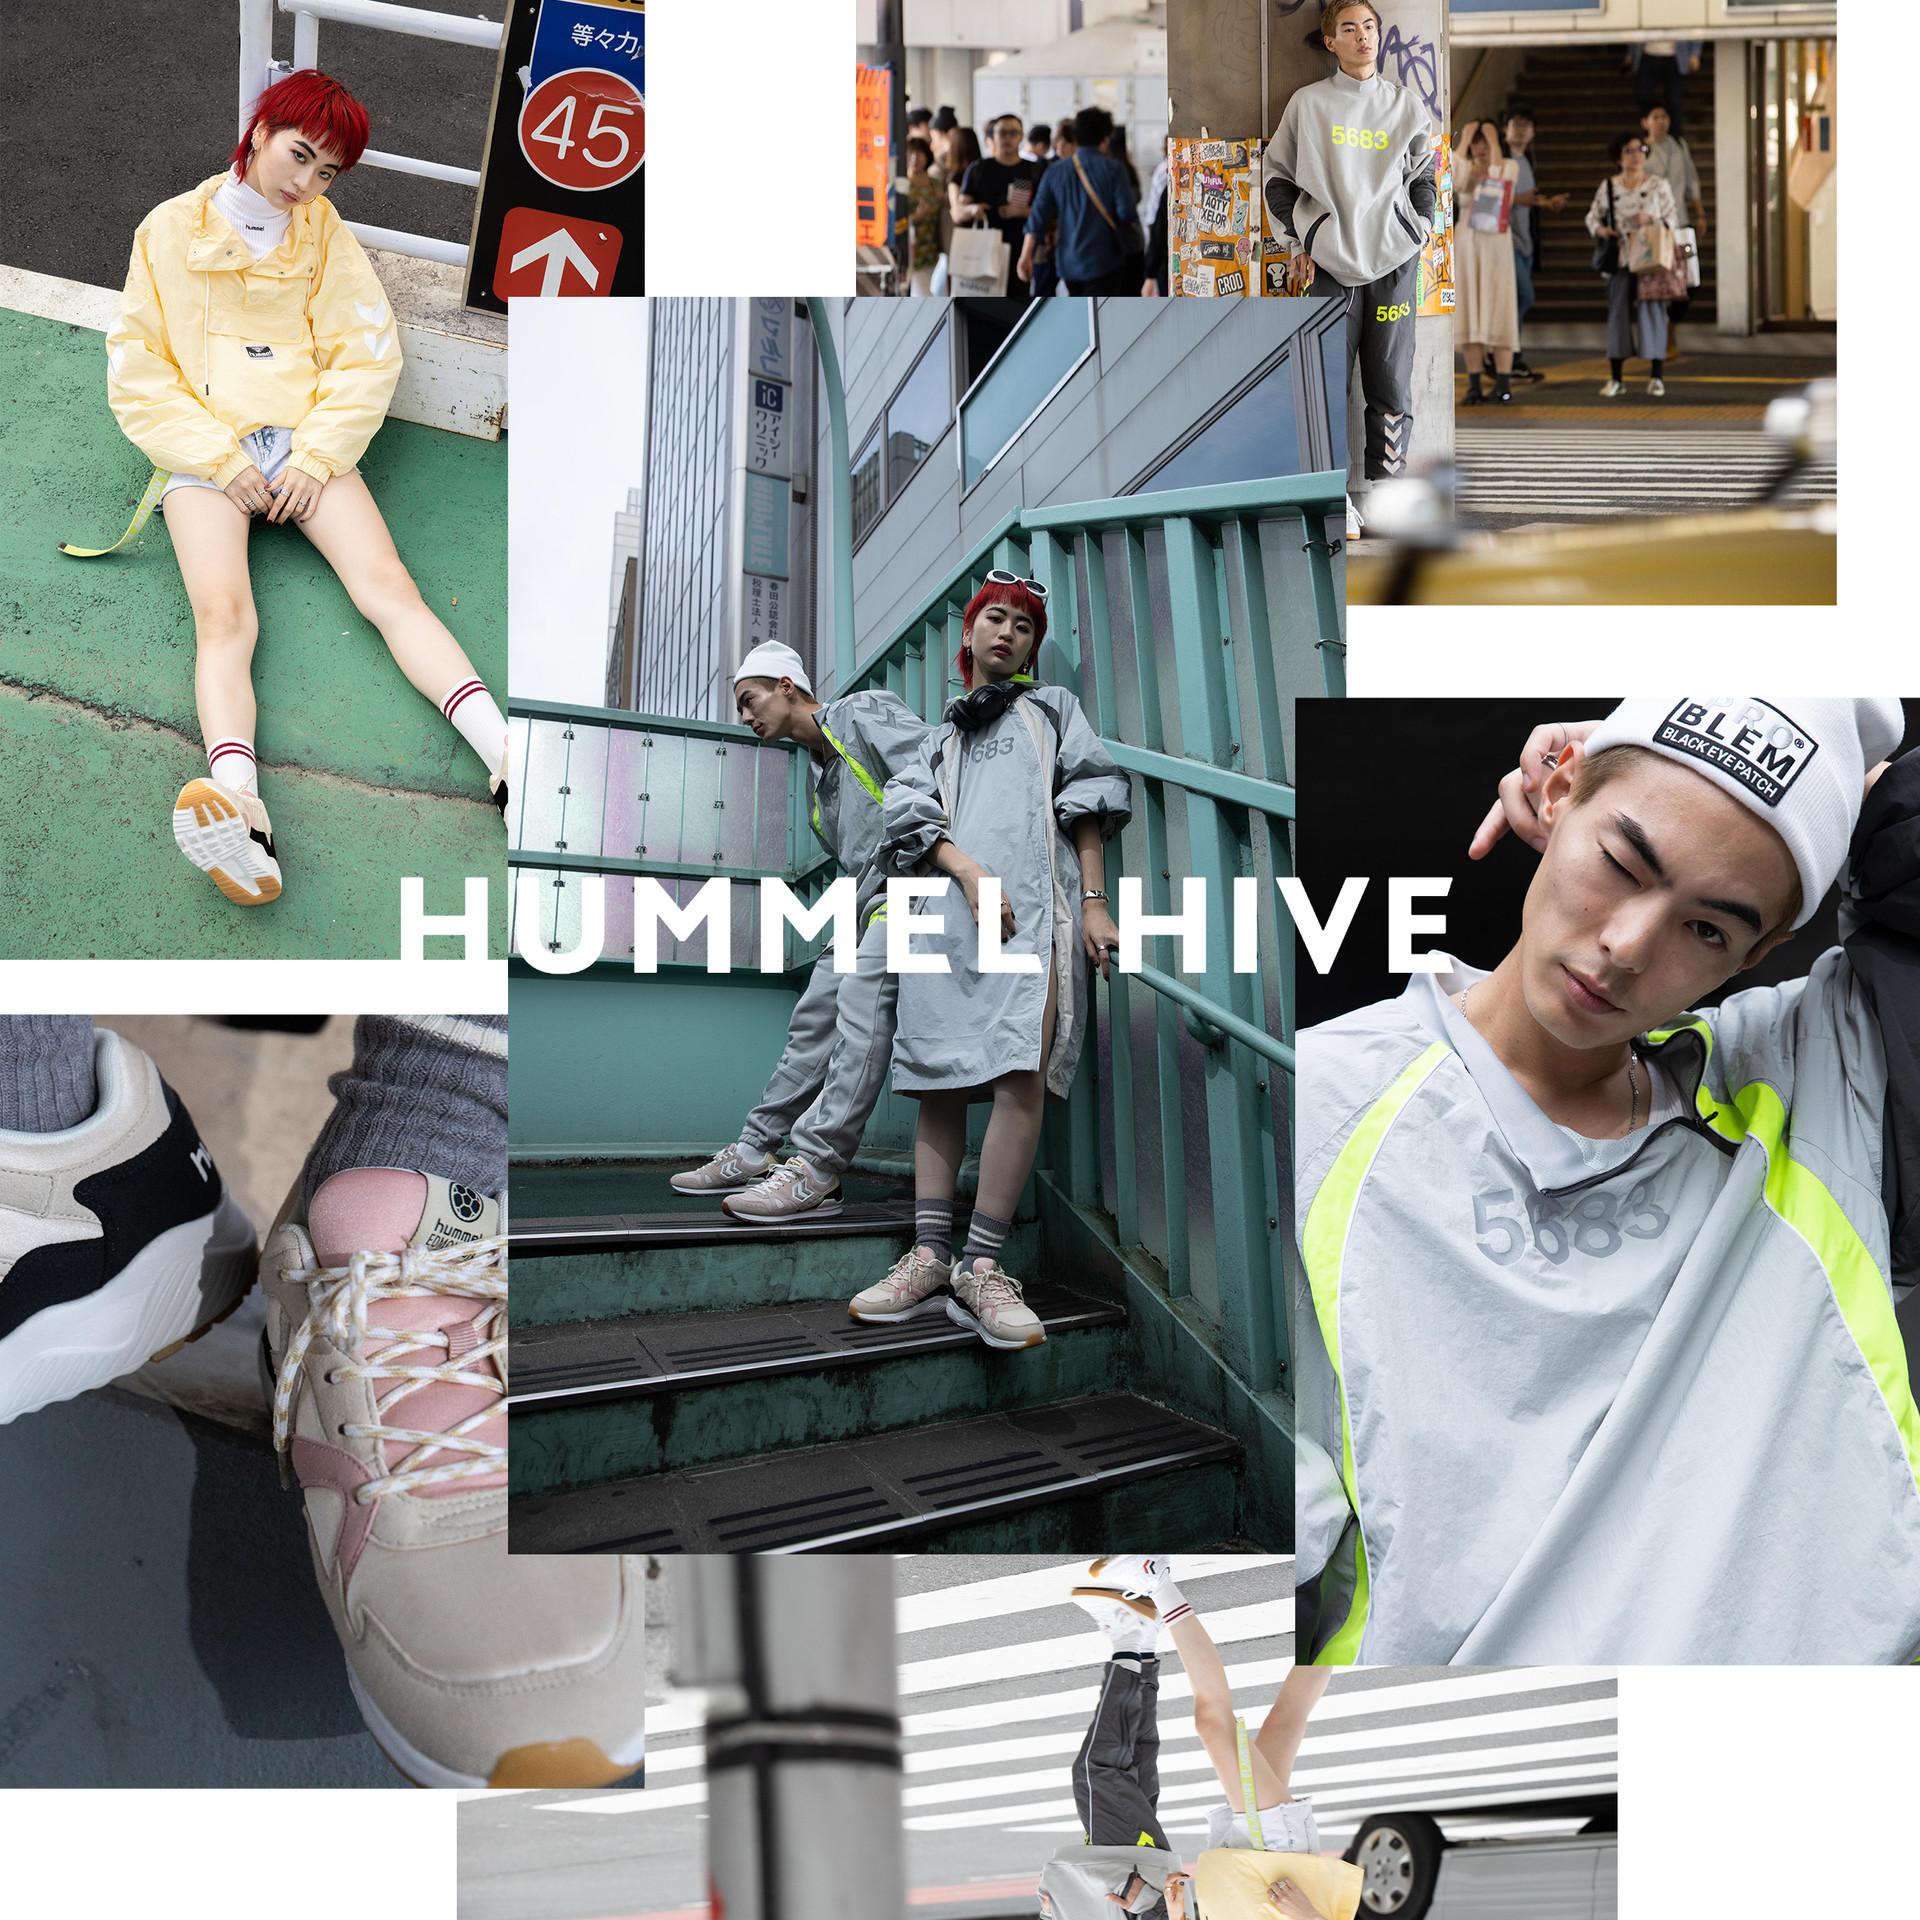 hummel_post.jpg